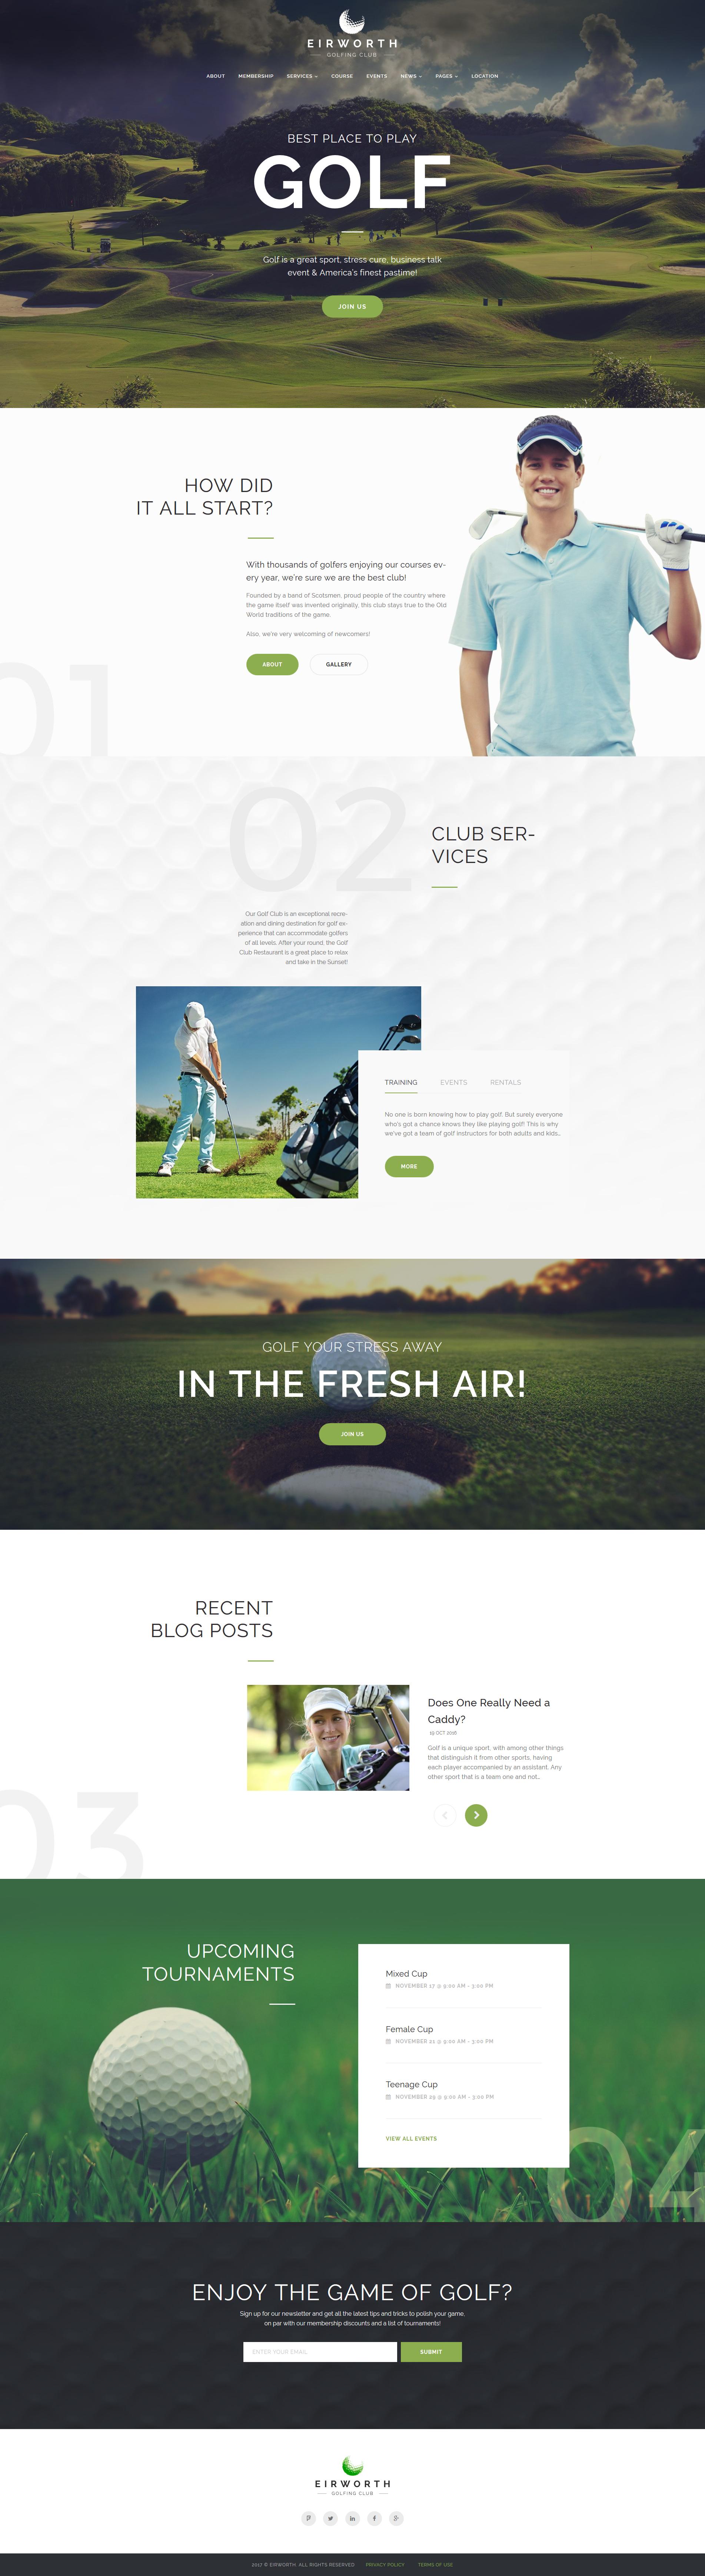 Responsive Eirworth - Golfing Club Responsive Wordpress #63966